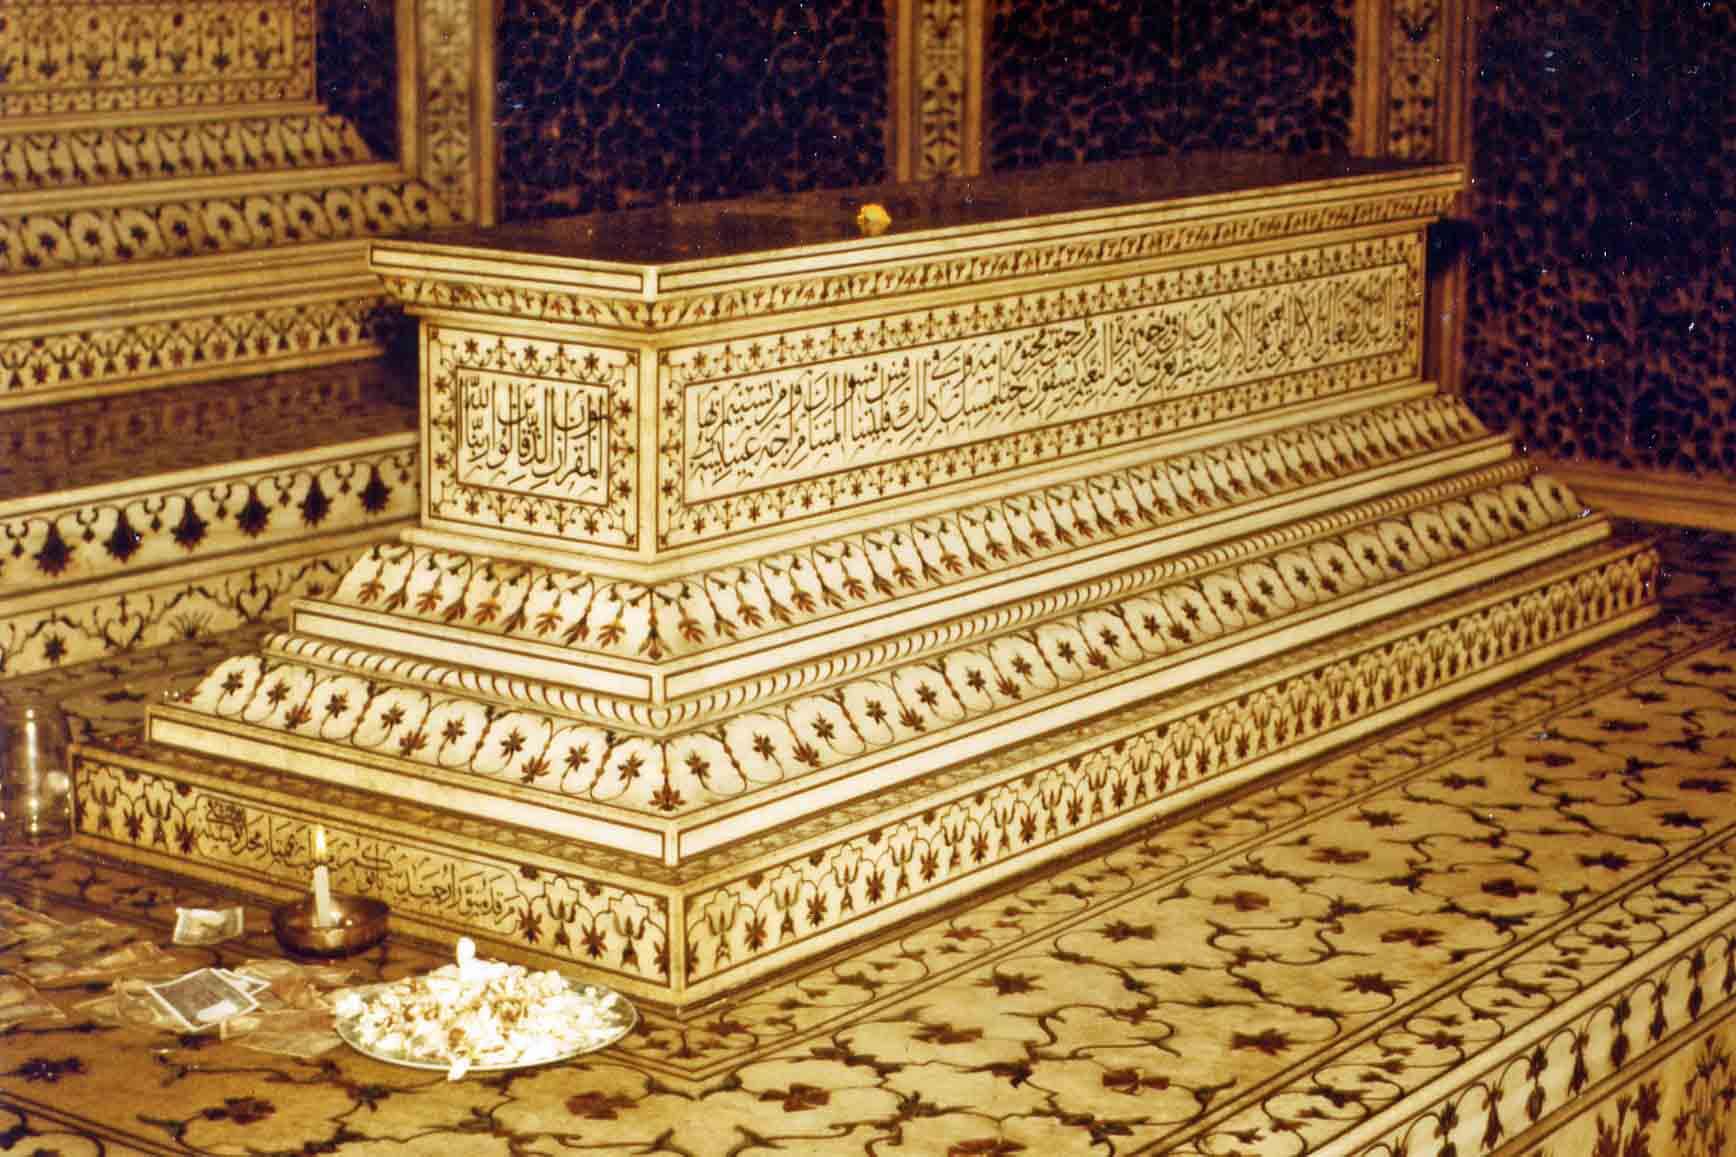 Coffin in the Taj Mahal